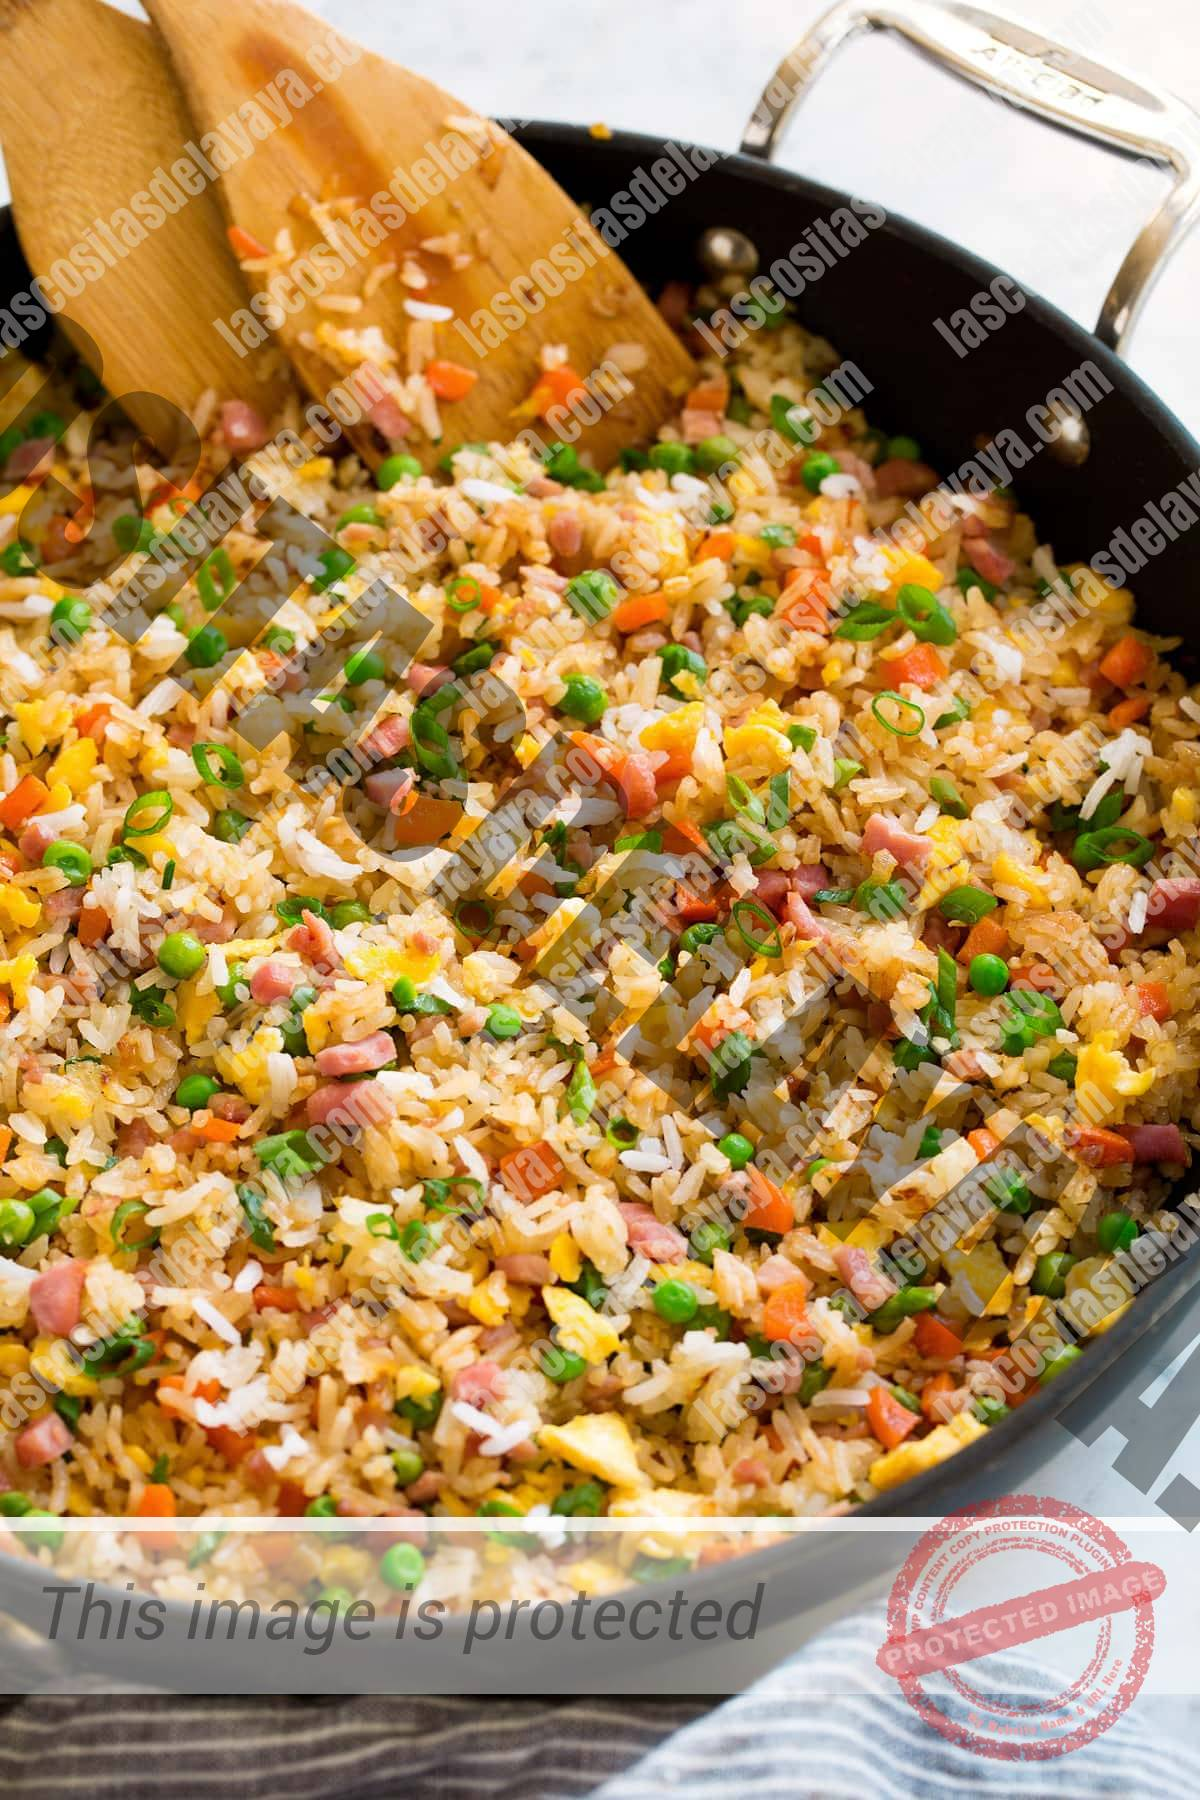 Cerrar vista lateral de arroz frito en una sartén.